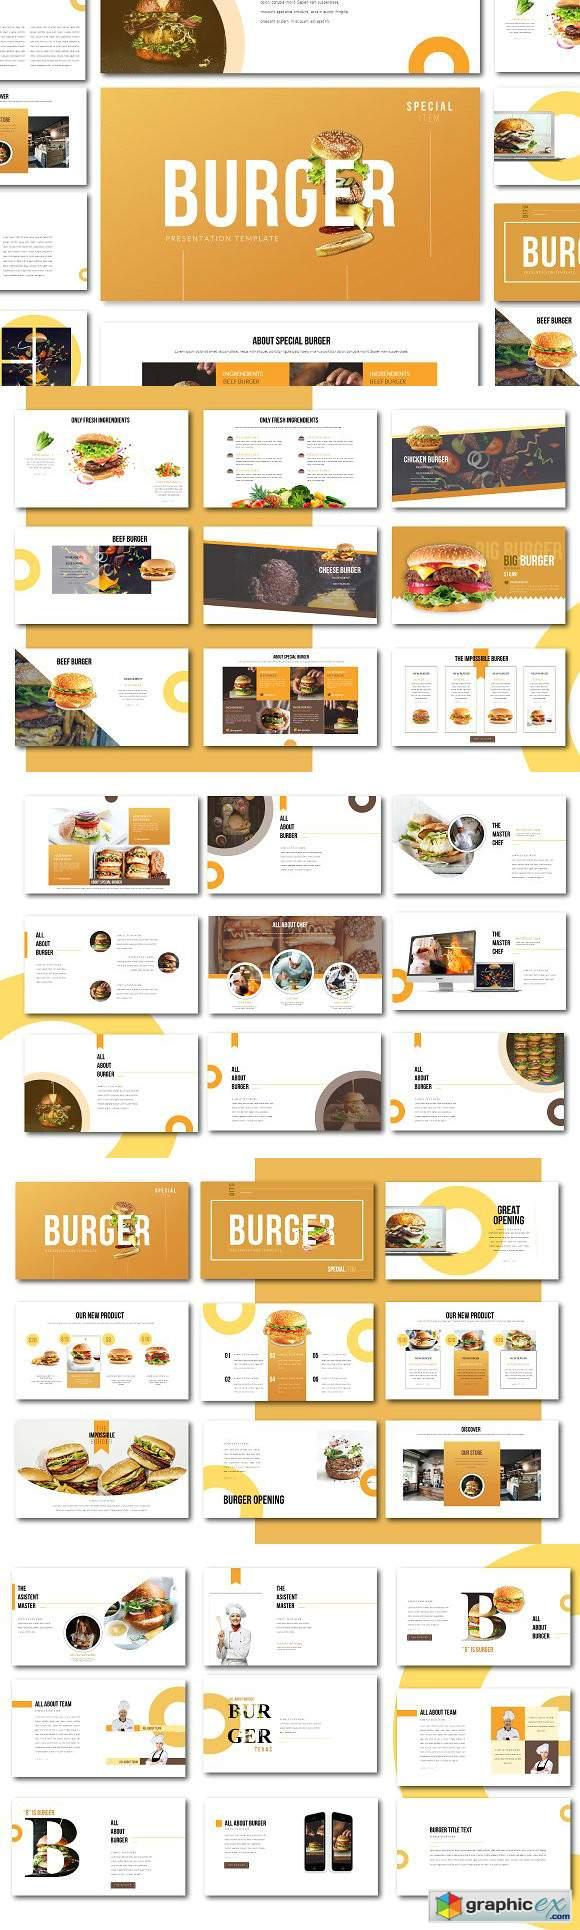 special burger keynote presentation  u00bb free download vector